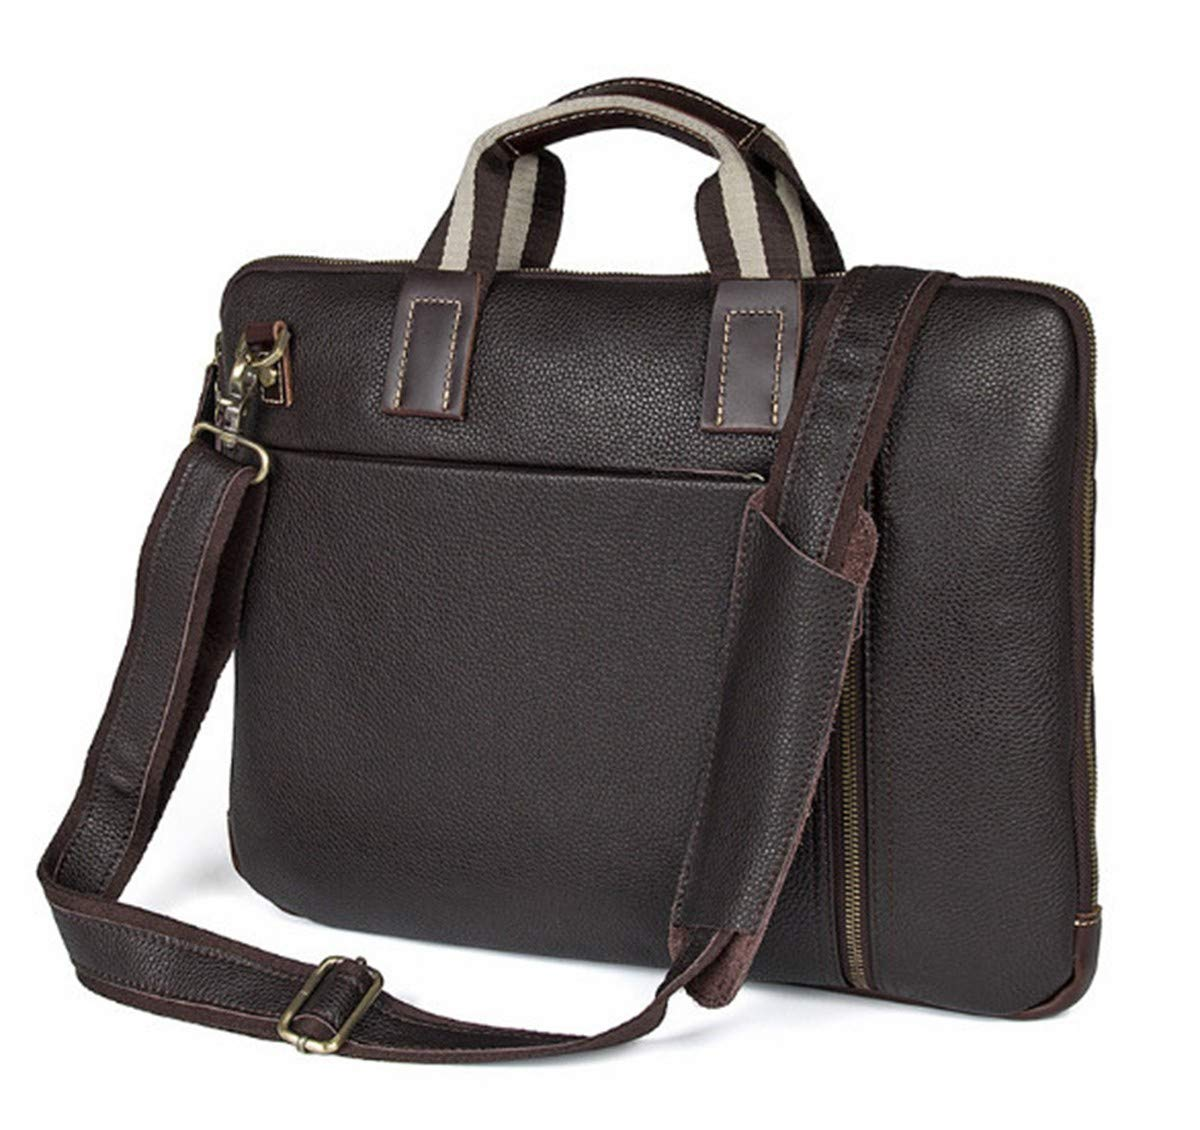 Lianai11 Laptoptasche Herren Geschäft Laptop Tasche Aktentasche Schulter Messenger Bag